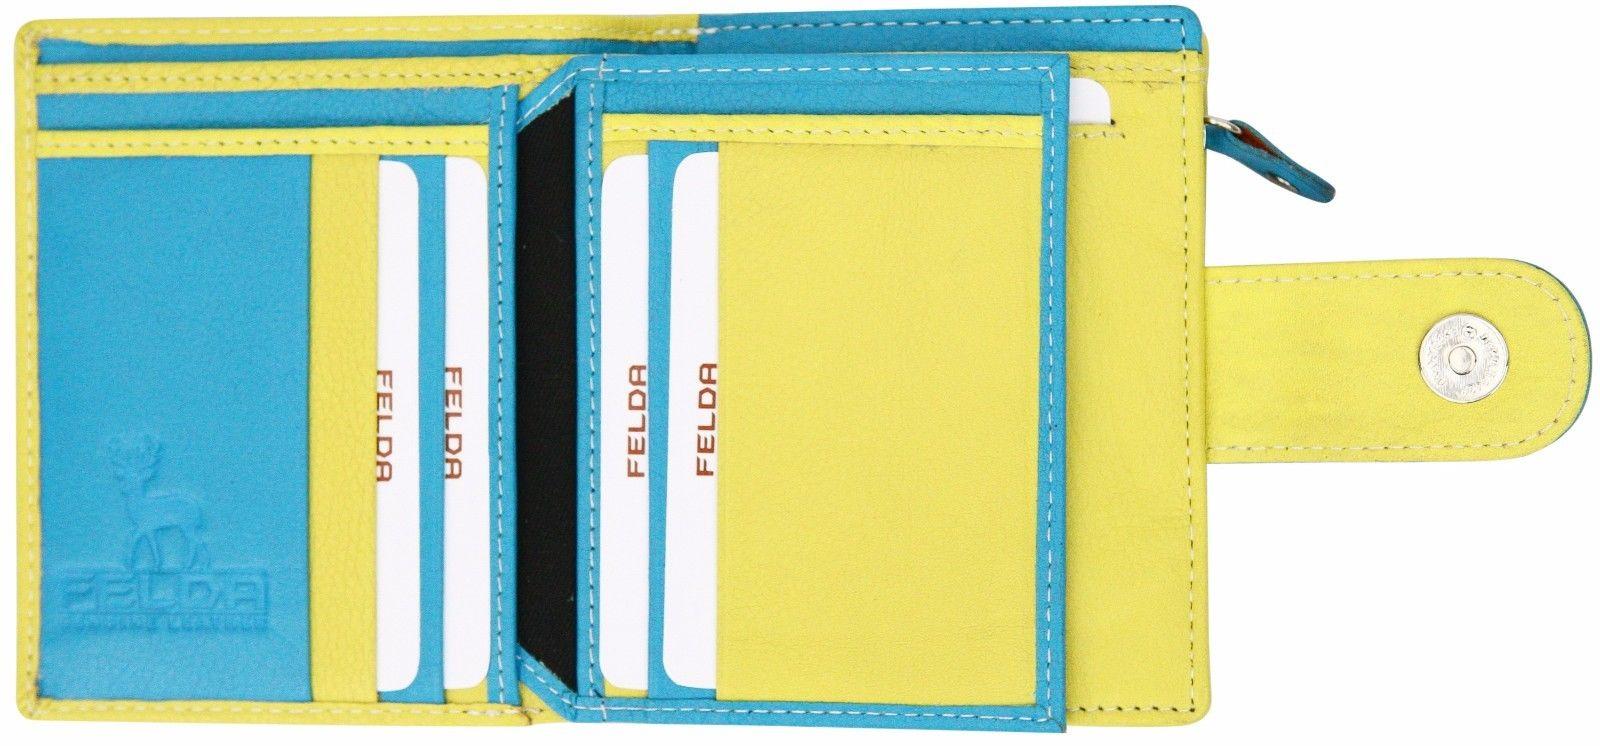 Felda-RFID-onorevoli-MEDAGLIA-amp-Card-Purse-Wallet-Genuine-Leather-Multi-SOFT-BOX-REGALO miniatura 33